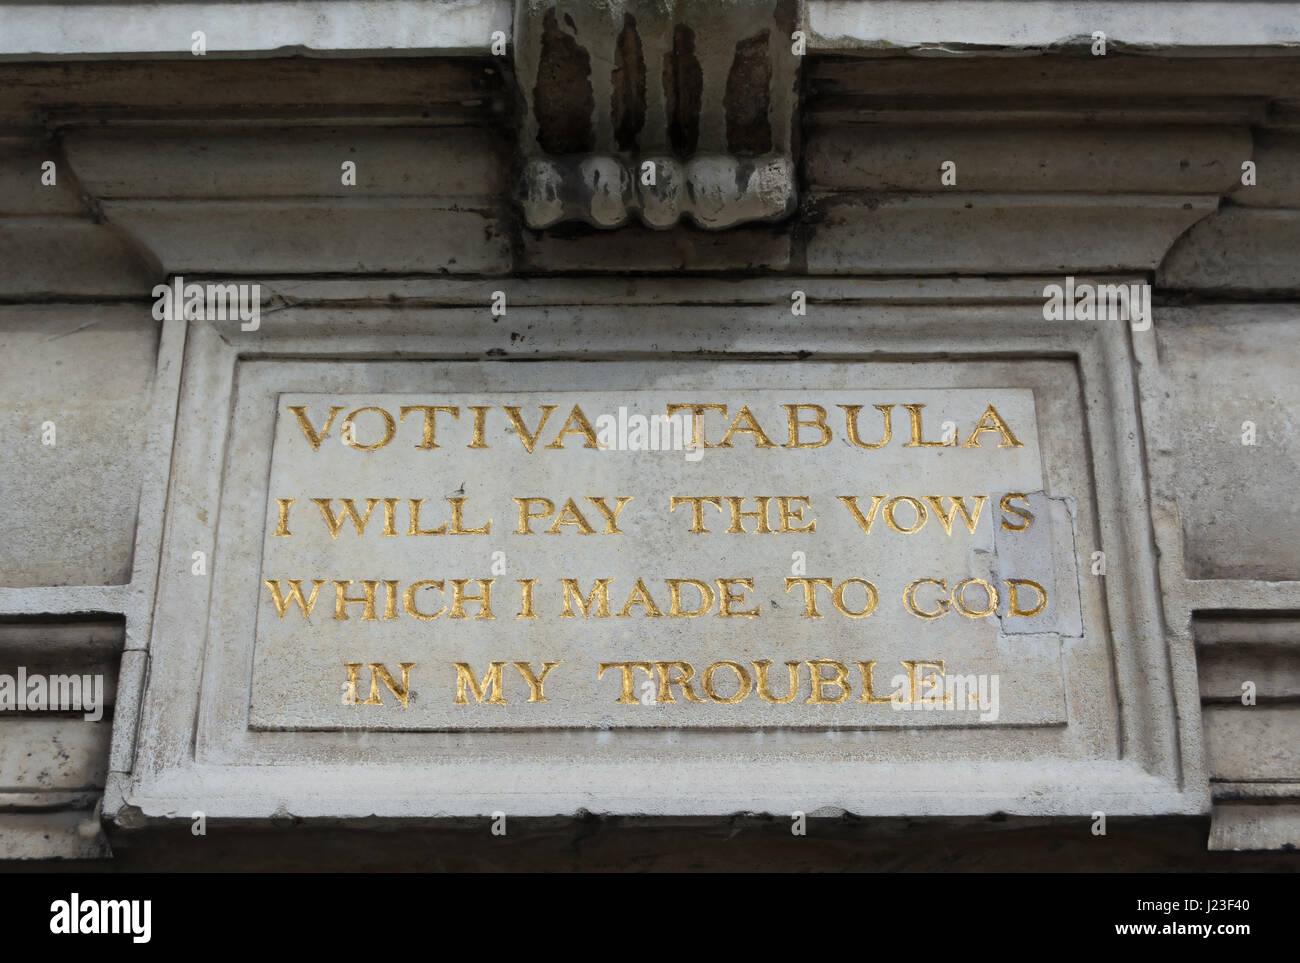 votiva tabula, latin inscription with english language vow following, on bishop duppa's almshouses, richmond, surrey, england Stock Photo